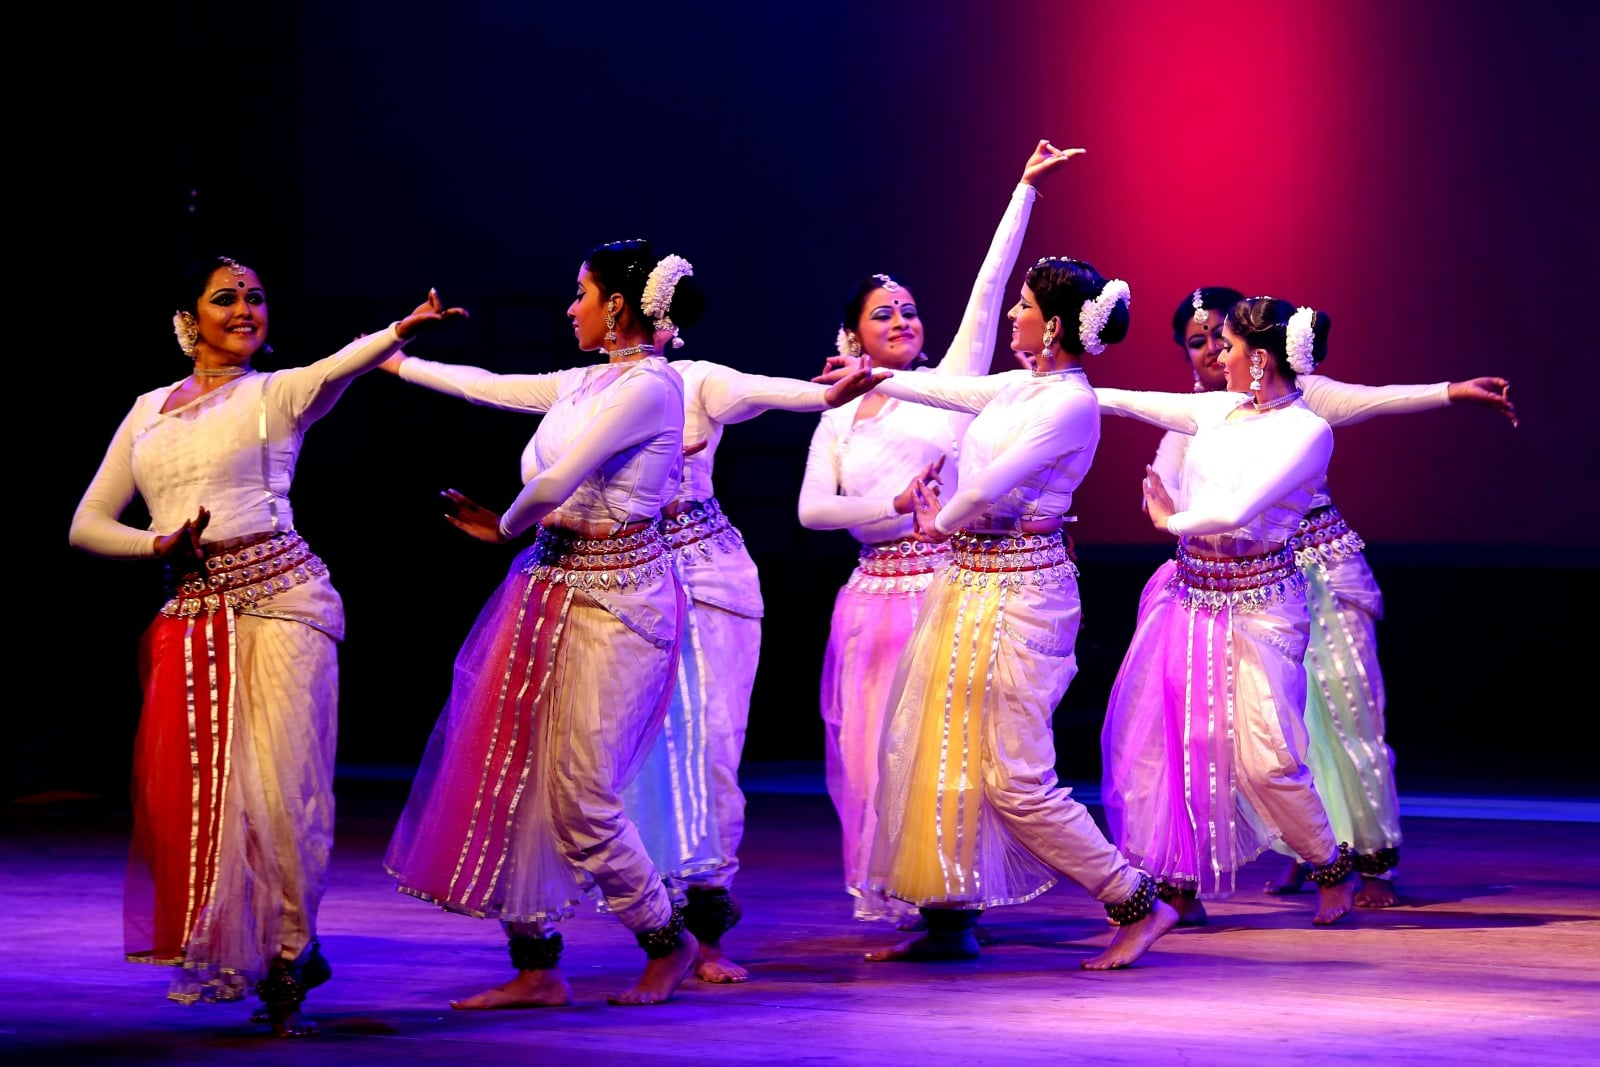 Indyjski taniec fot. EPA/JAGADEESH NV